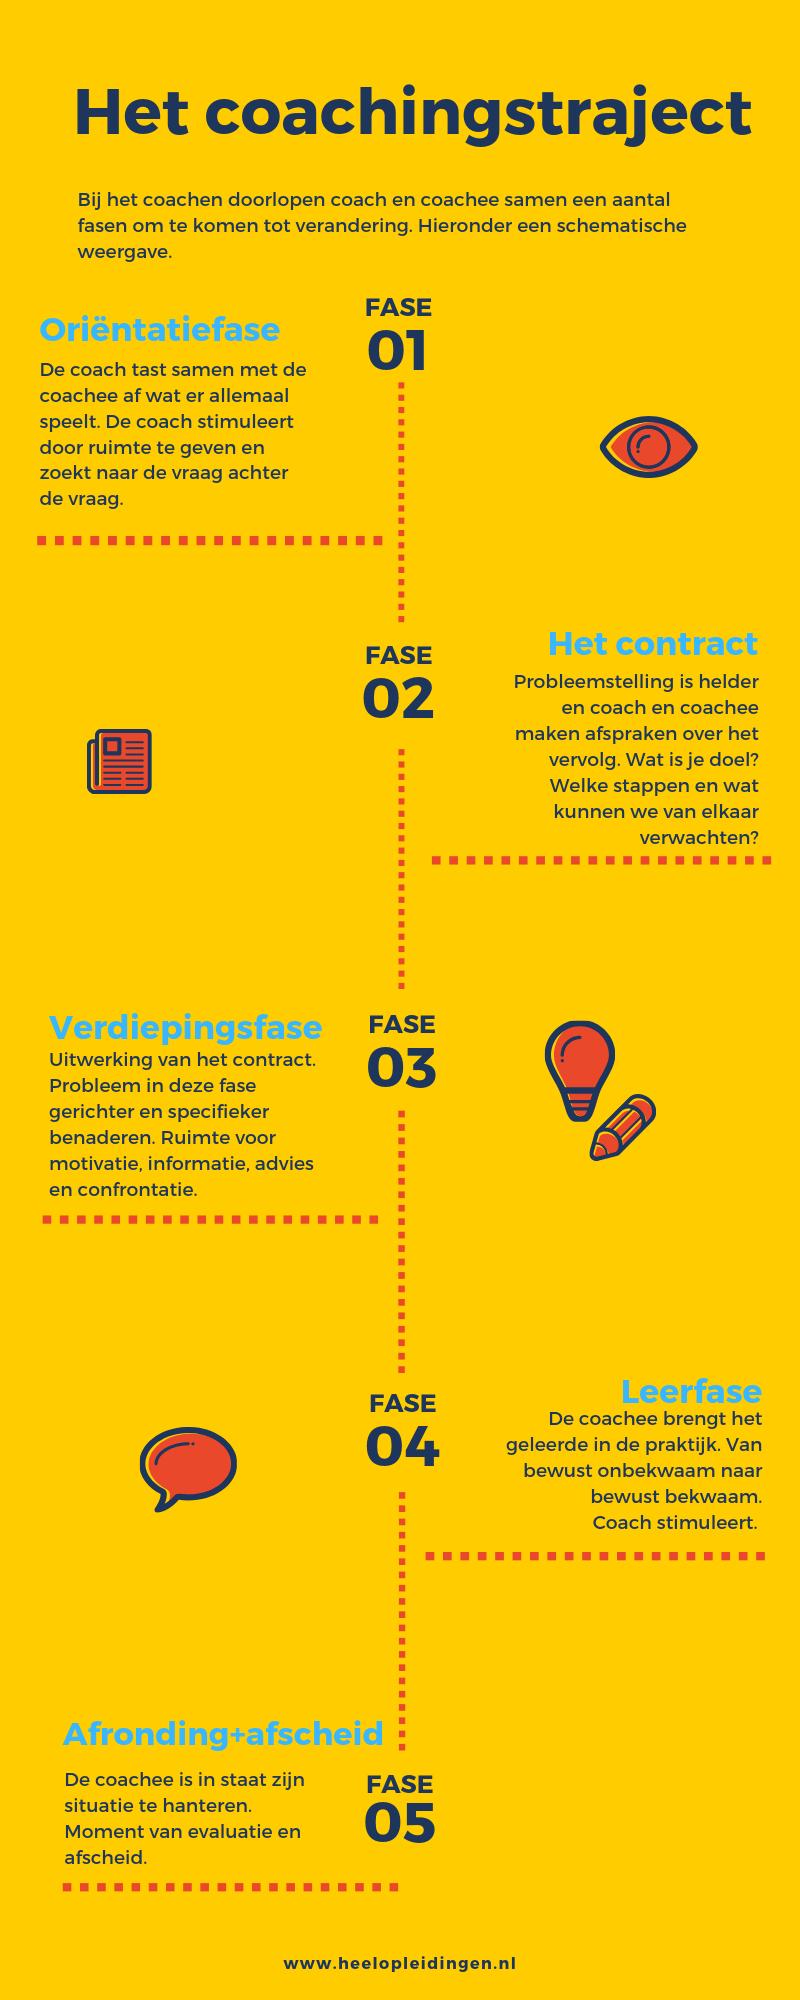 coachingstraject afbeelding 5 fases coachtraject